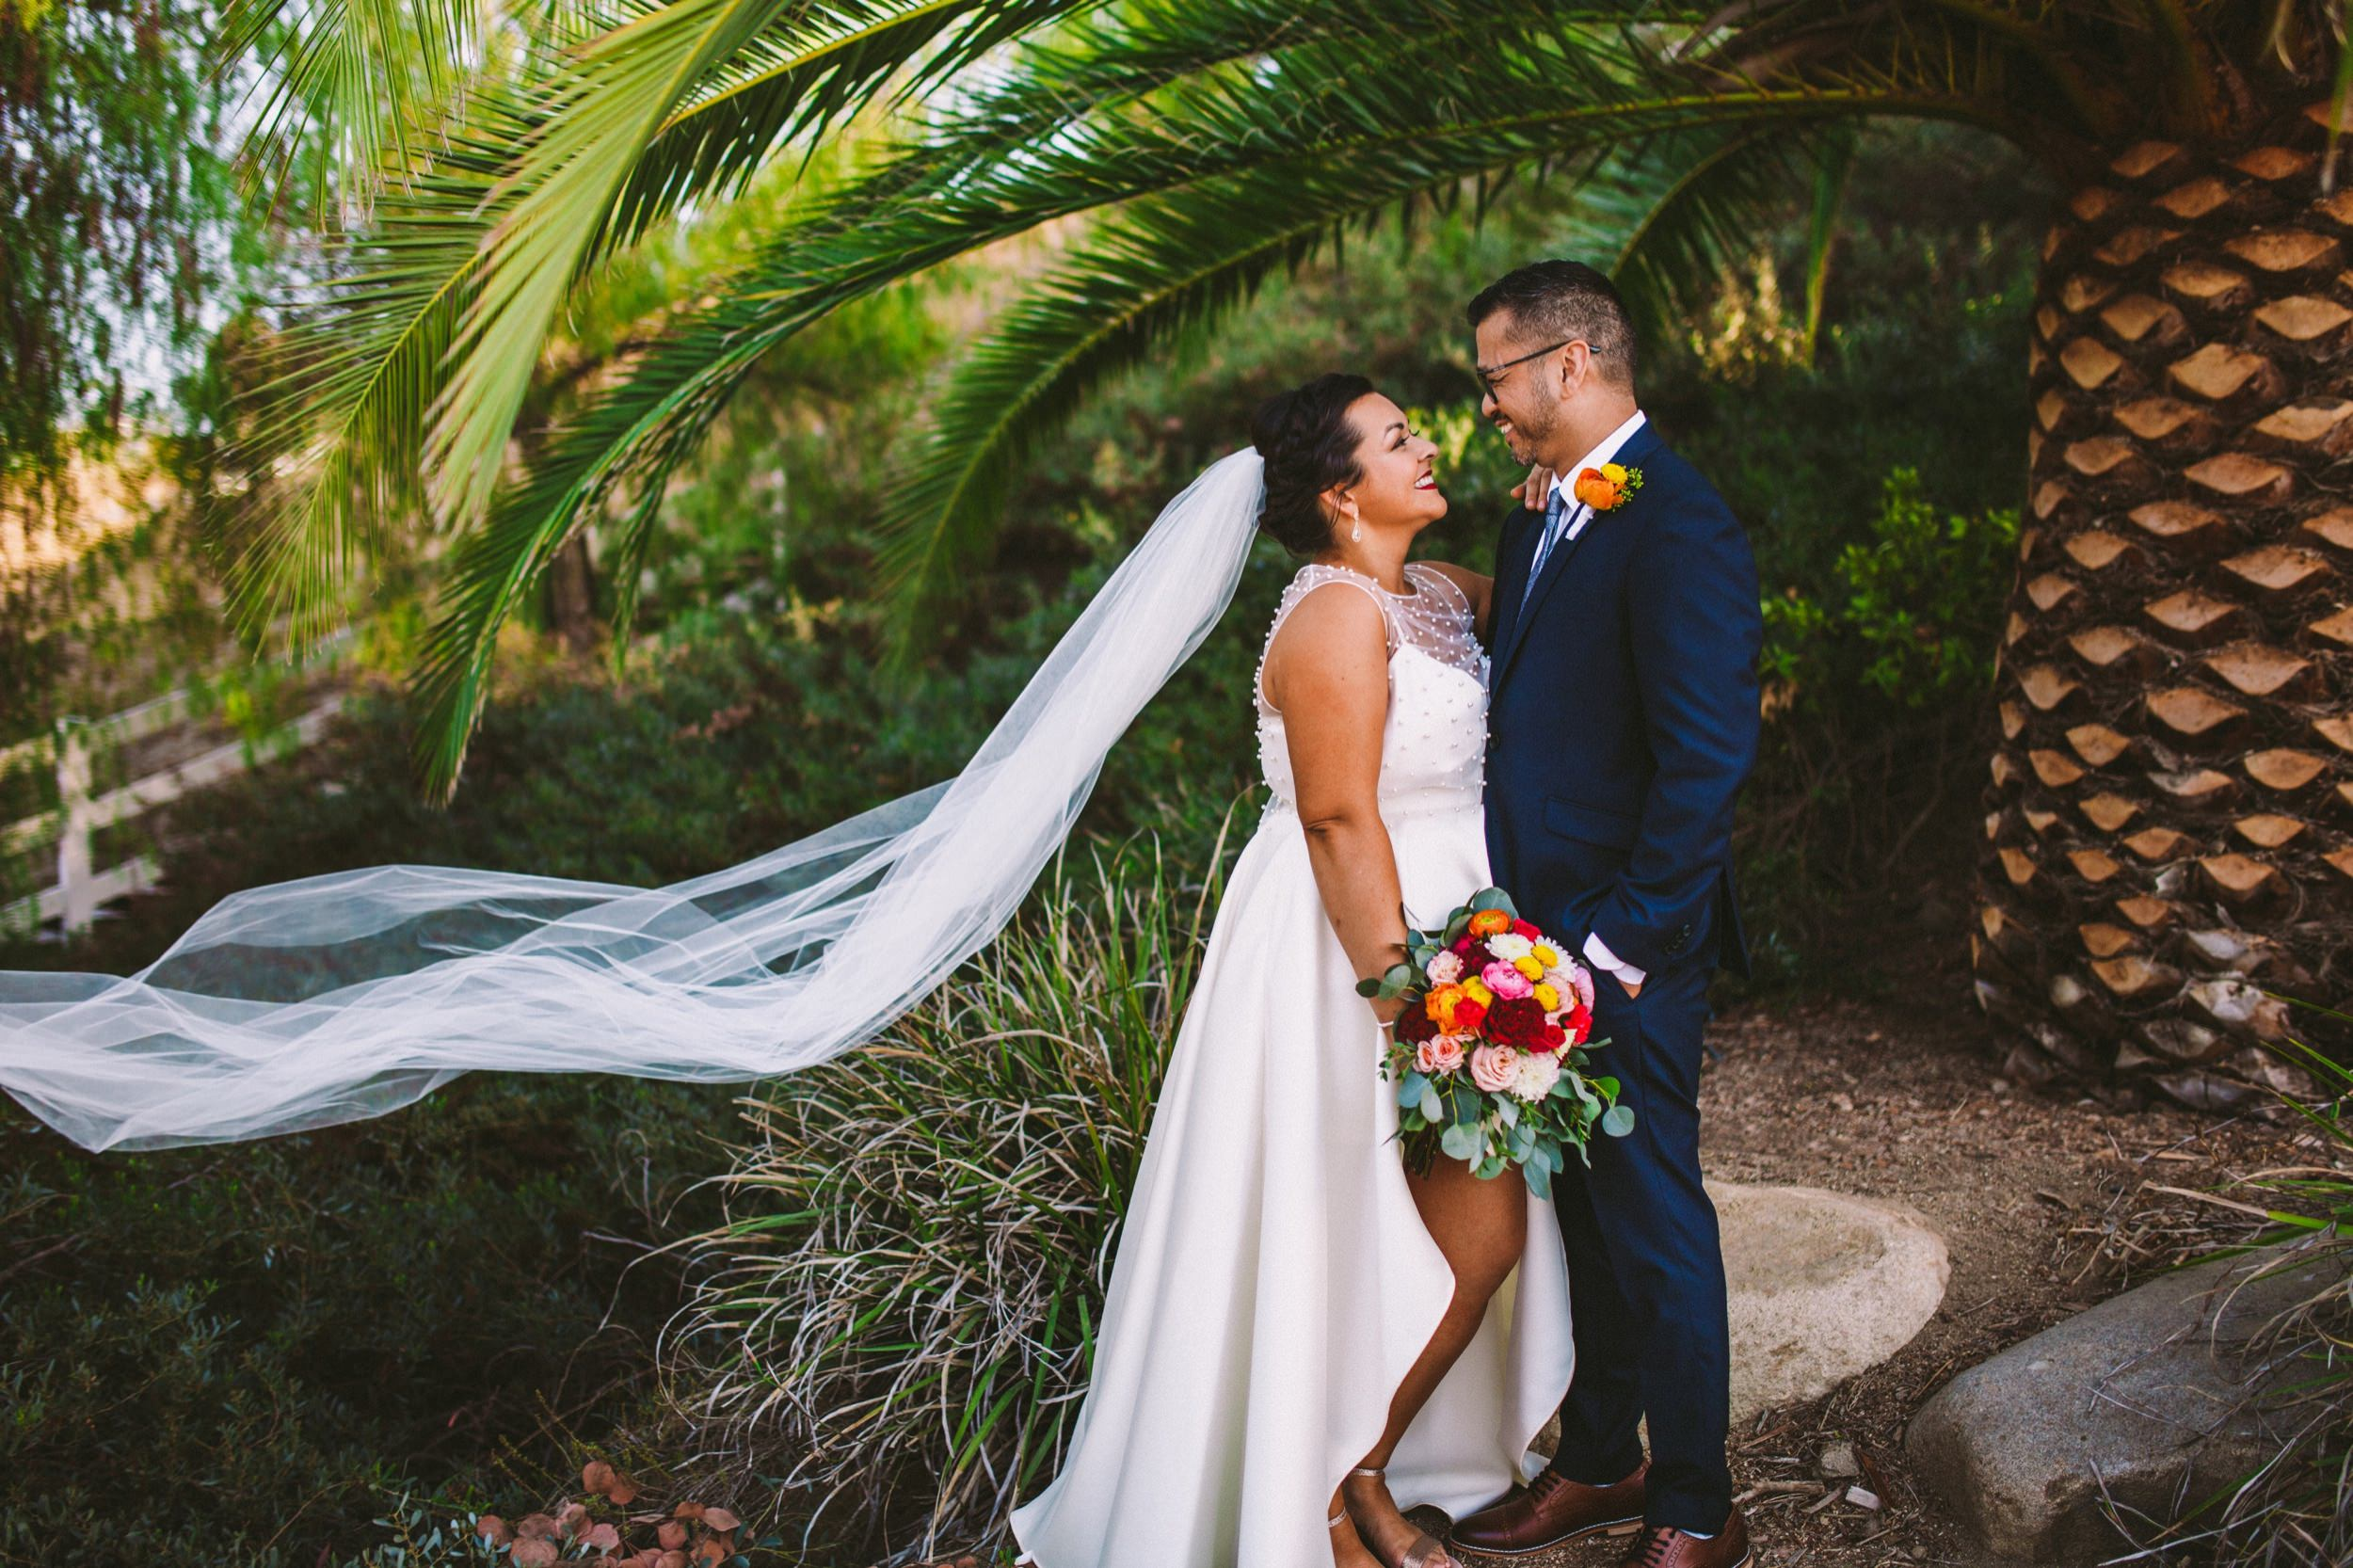 Joyful & Colorful Wedding Day Portraits with Flowing Veil in Temecula Wedding